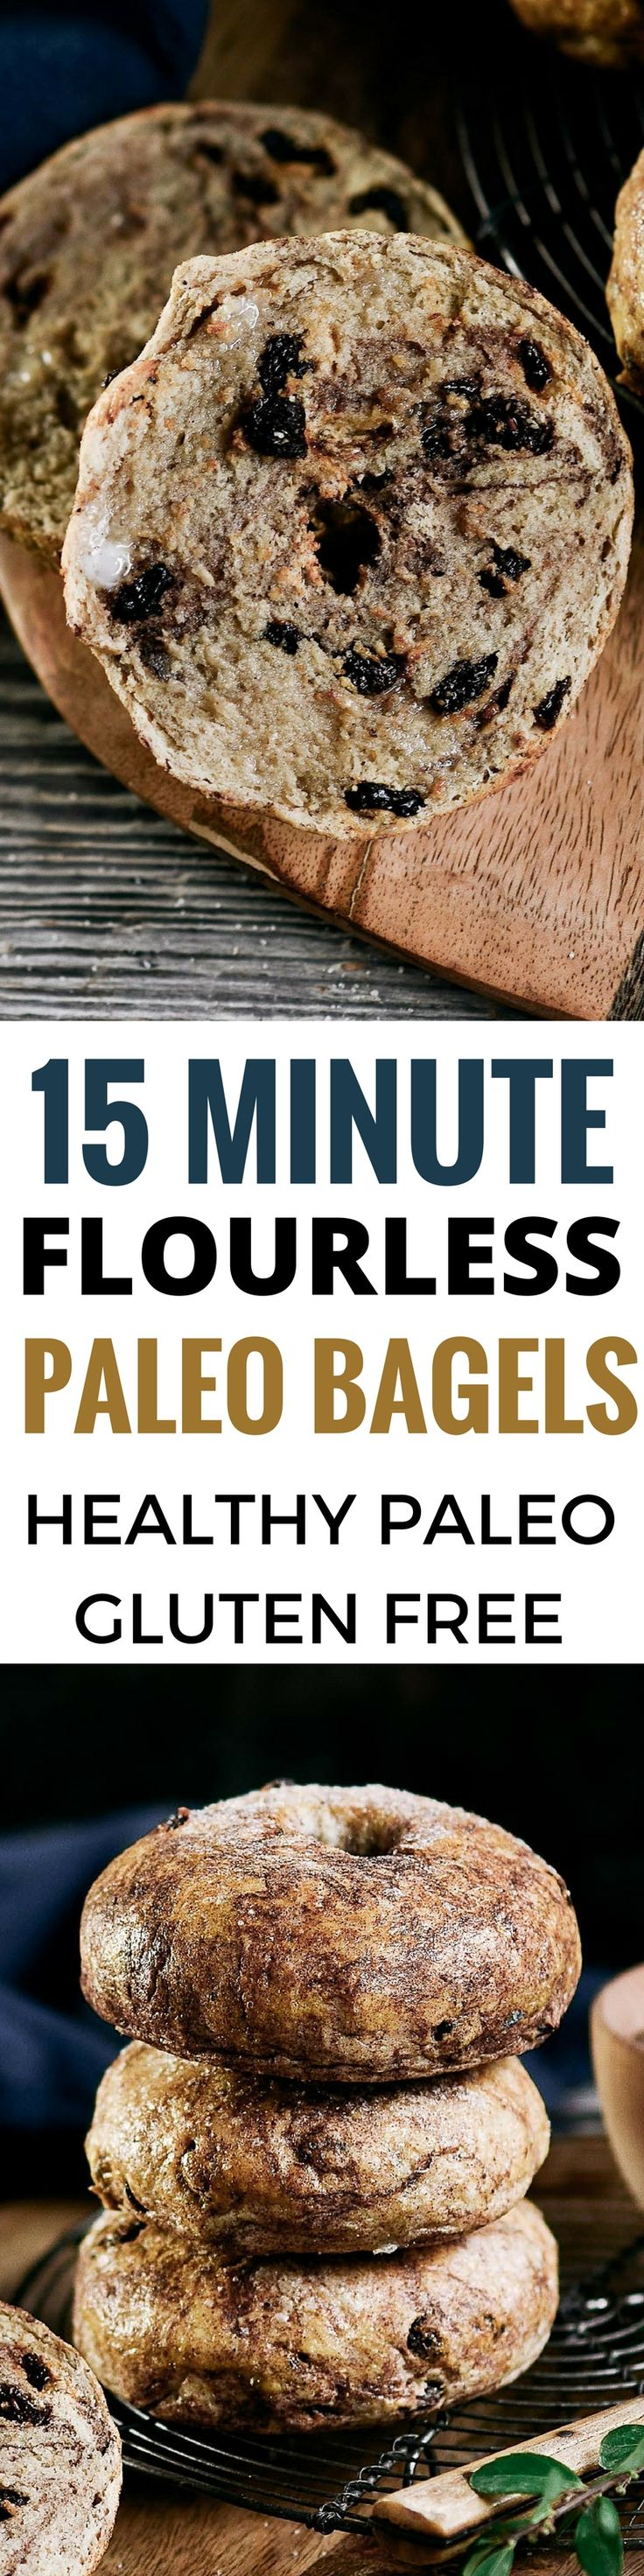 15 minute Easy Paleo bagels. Best gluten free bagel recipe. Healthy bread and bagel ideas. Bagel food photography.